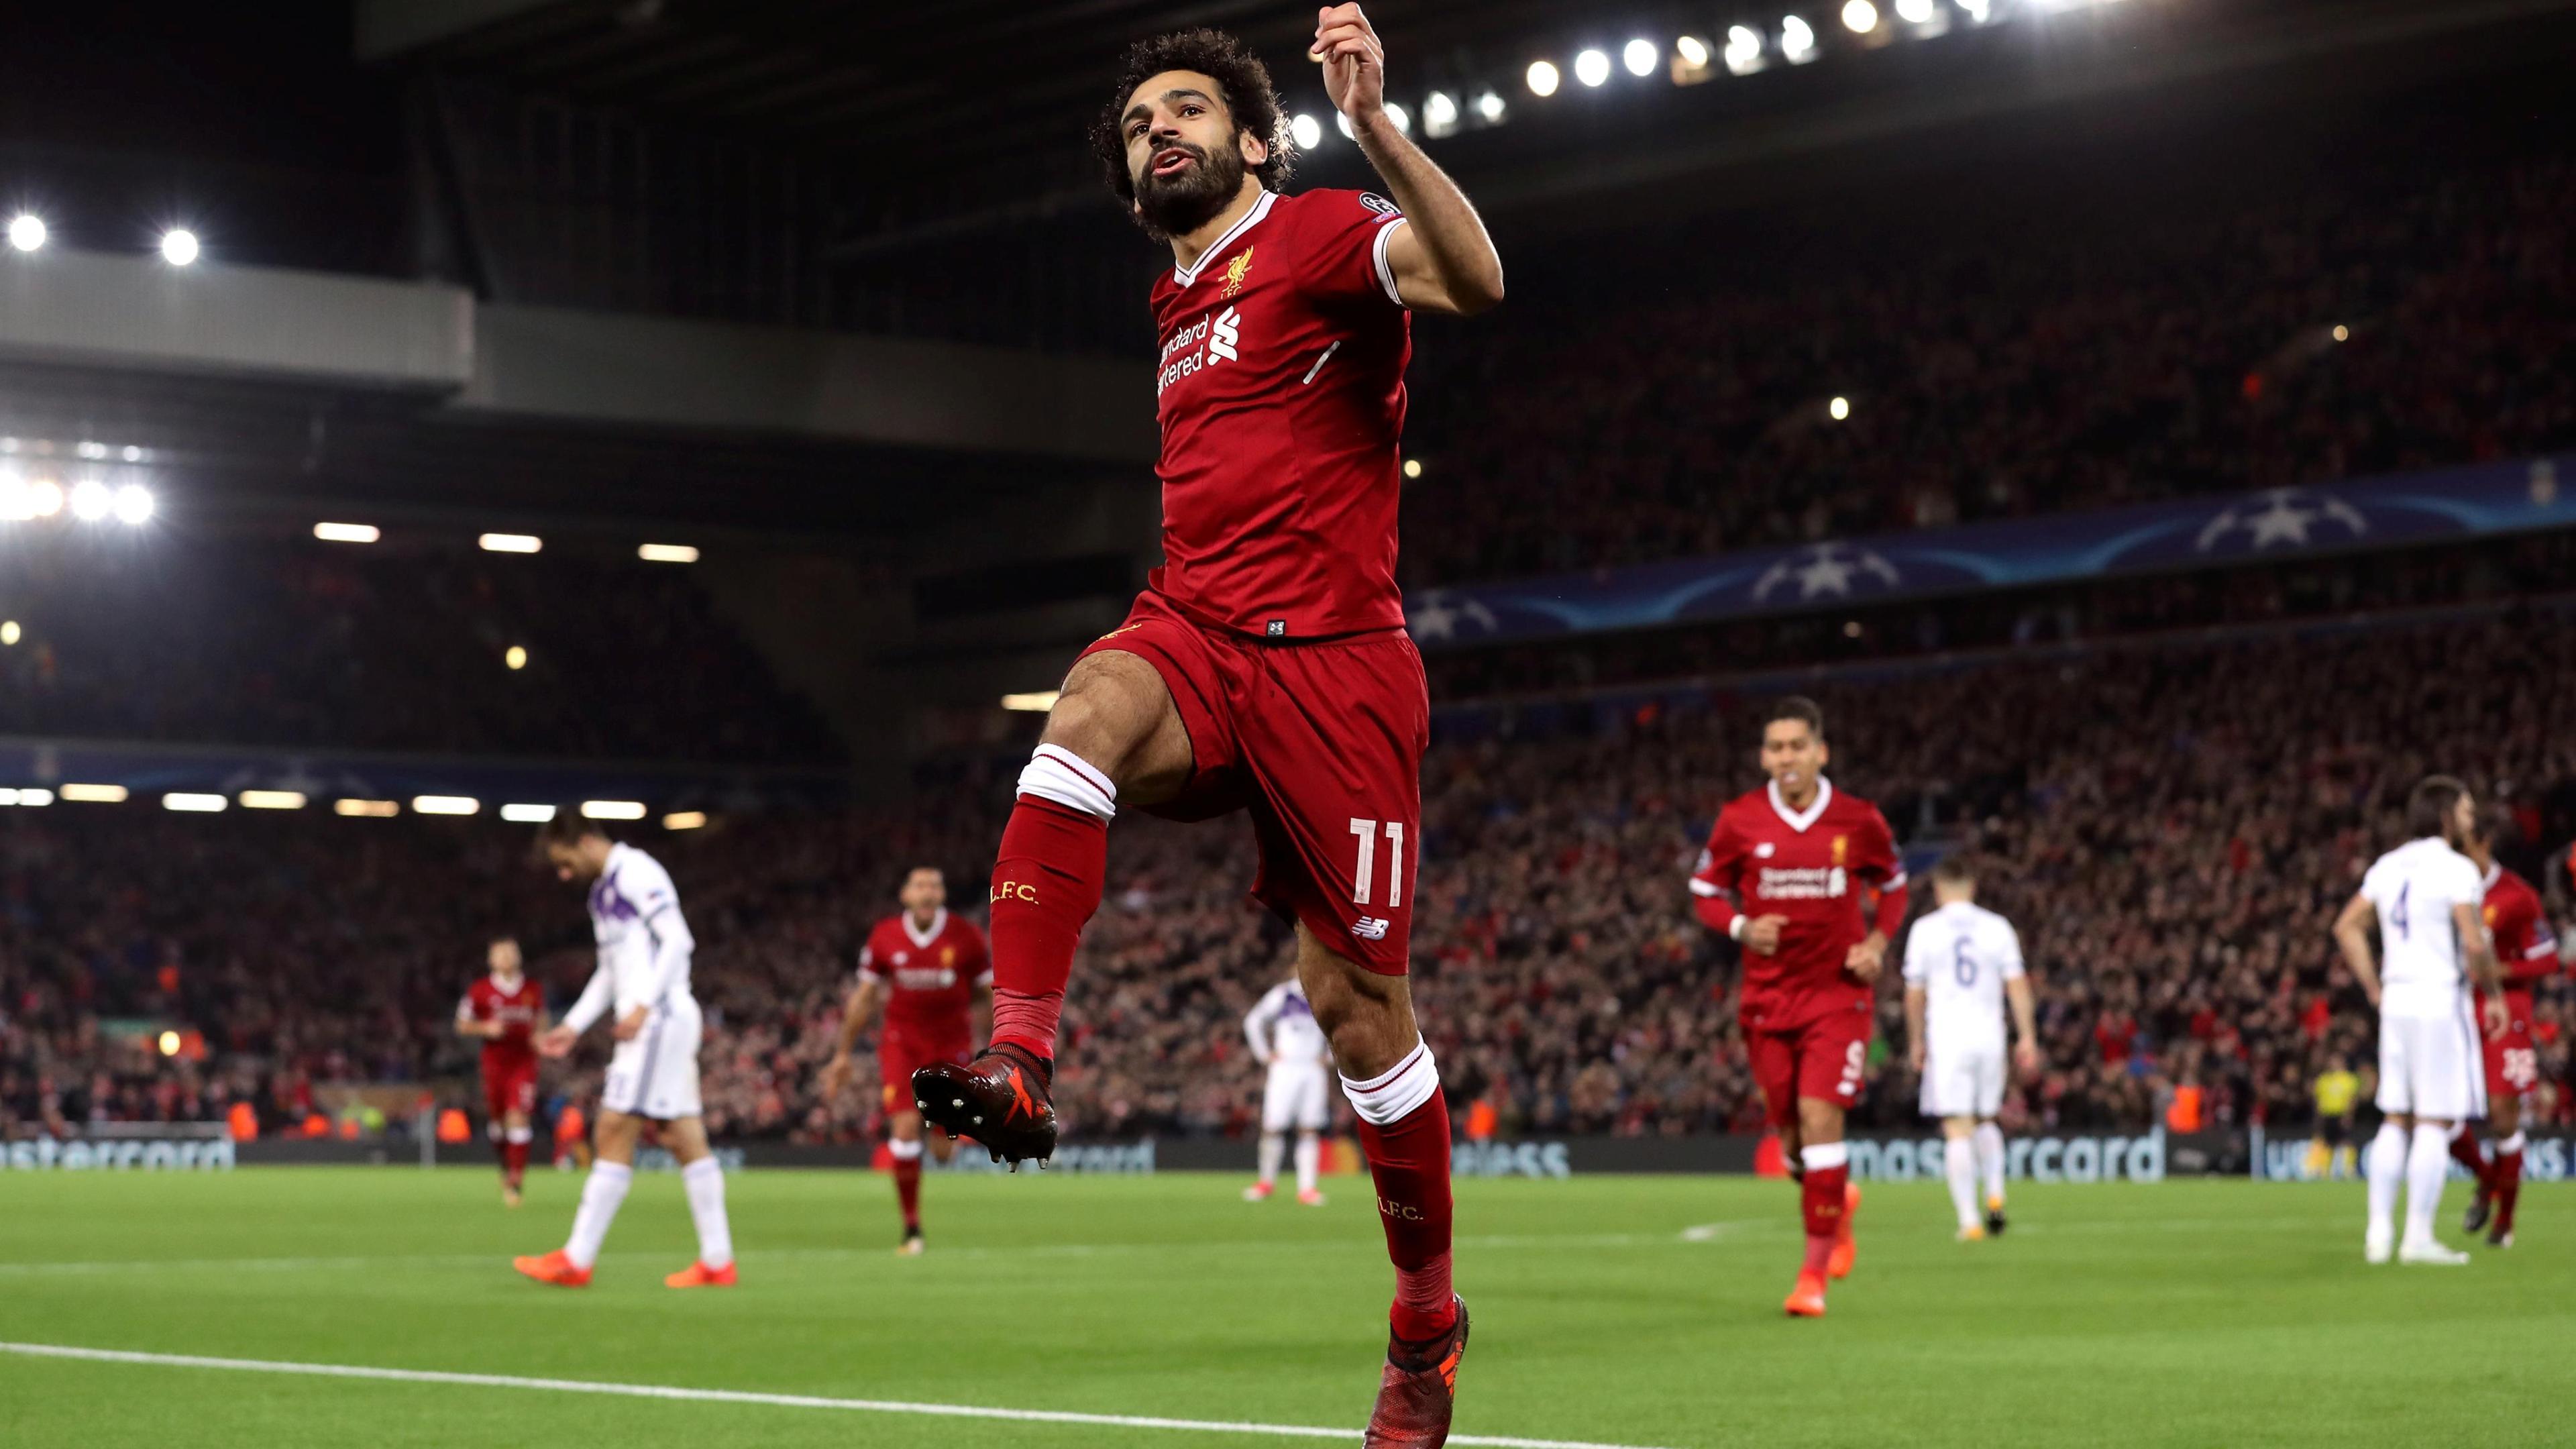 Mohamed Salah Egyptian Footballer Fifa World Cup 2018 Fifa World